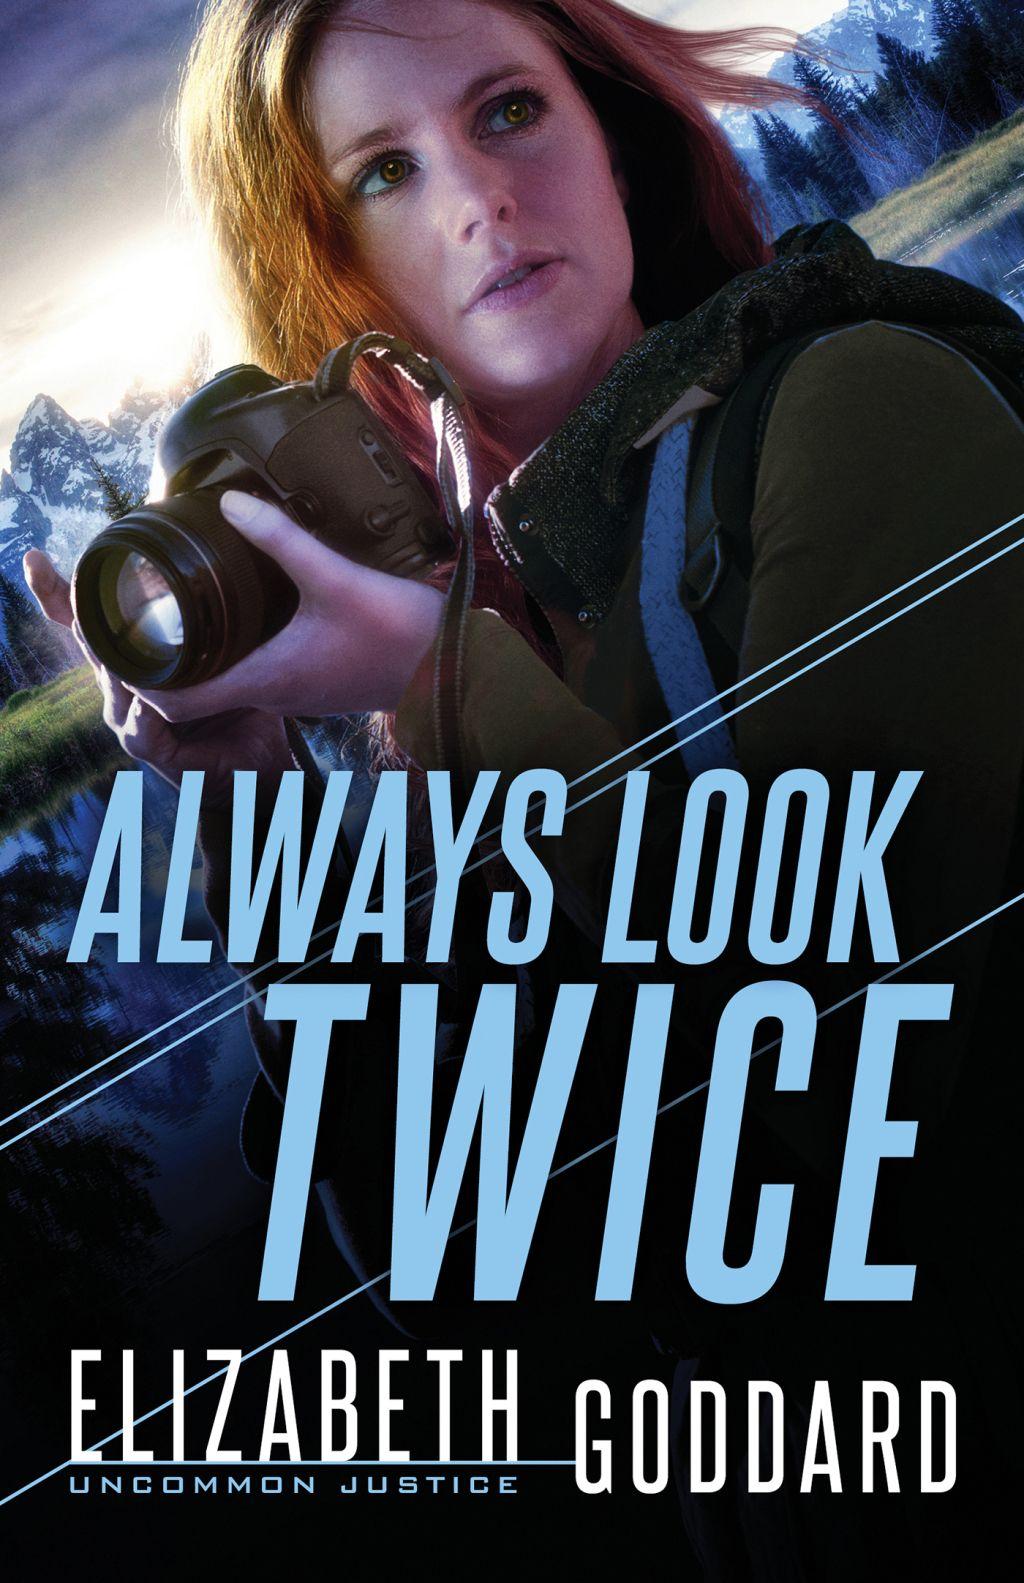 Always Look Twice (eBook) in 2020 Christian fiction